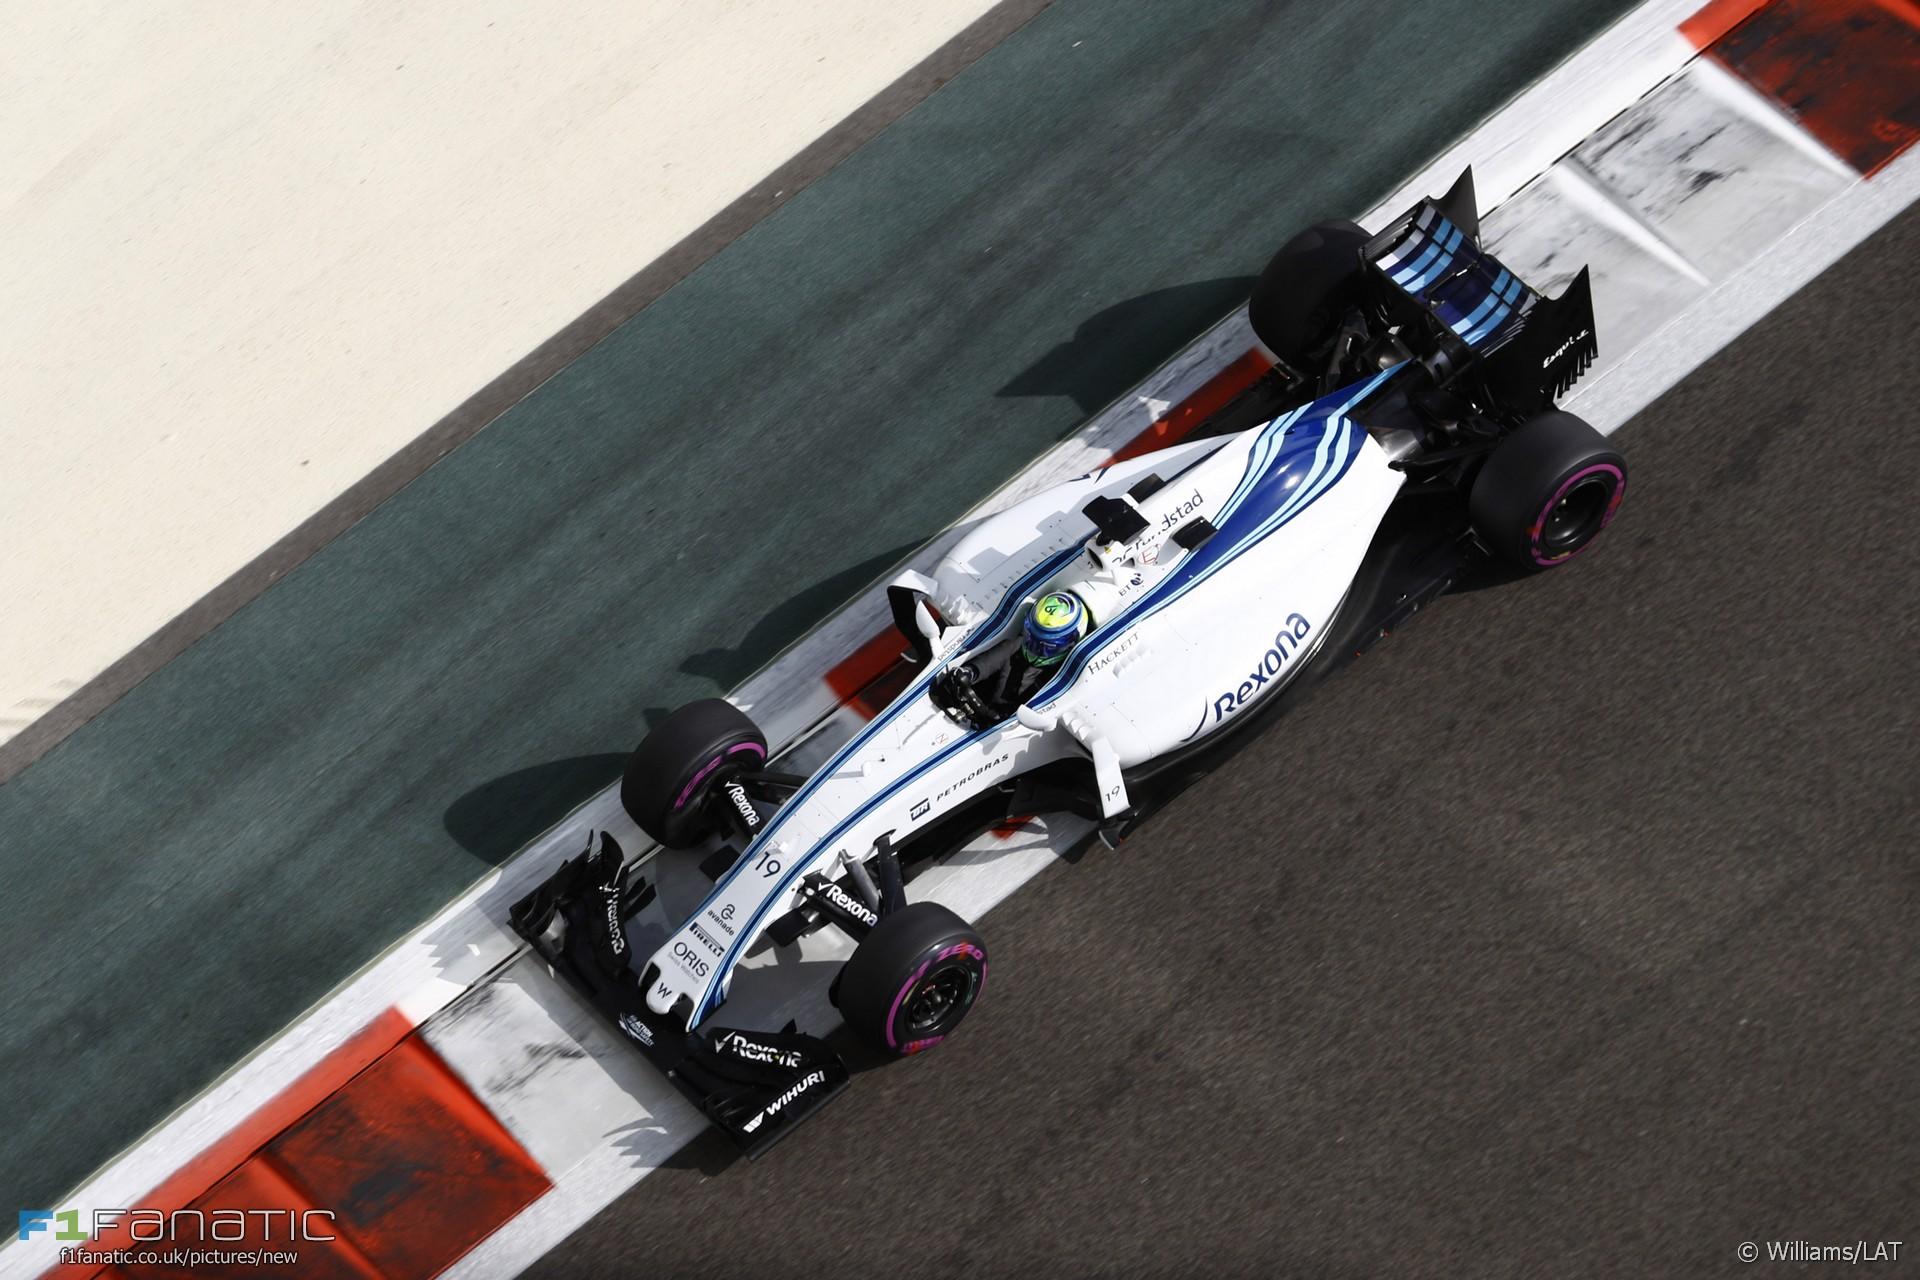 Felipe Massa, Williams, Yas Marina, 2016